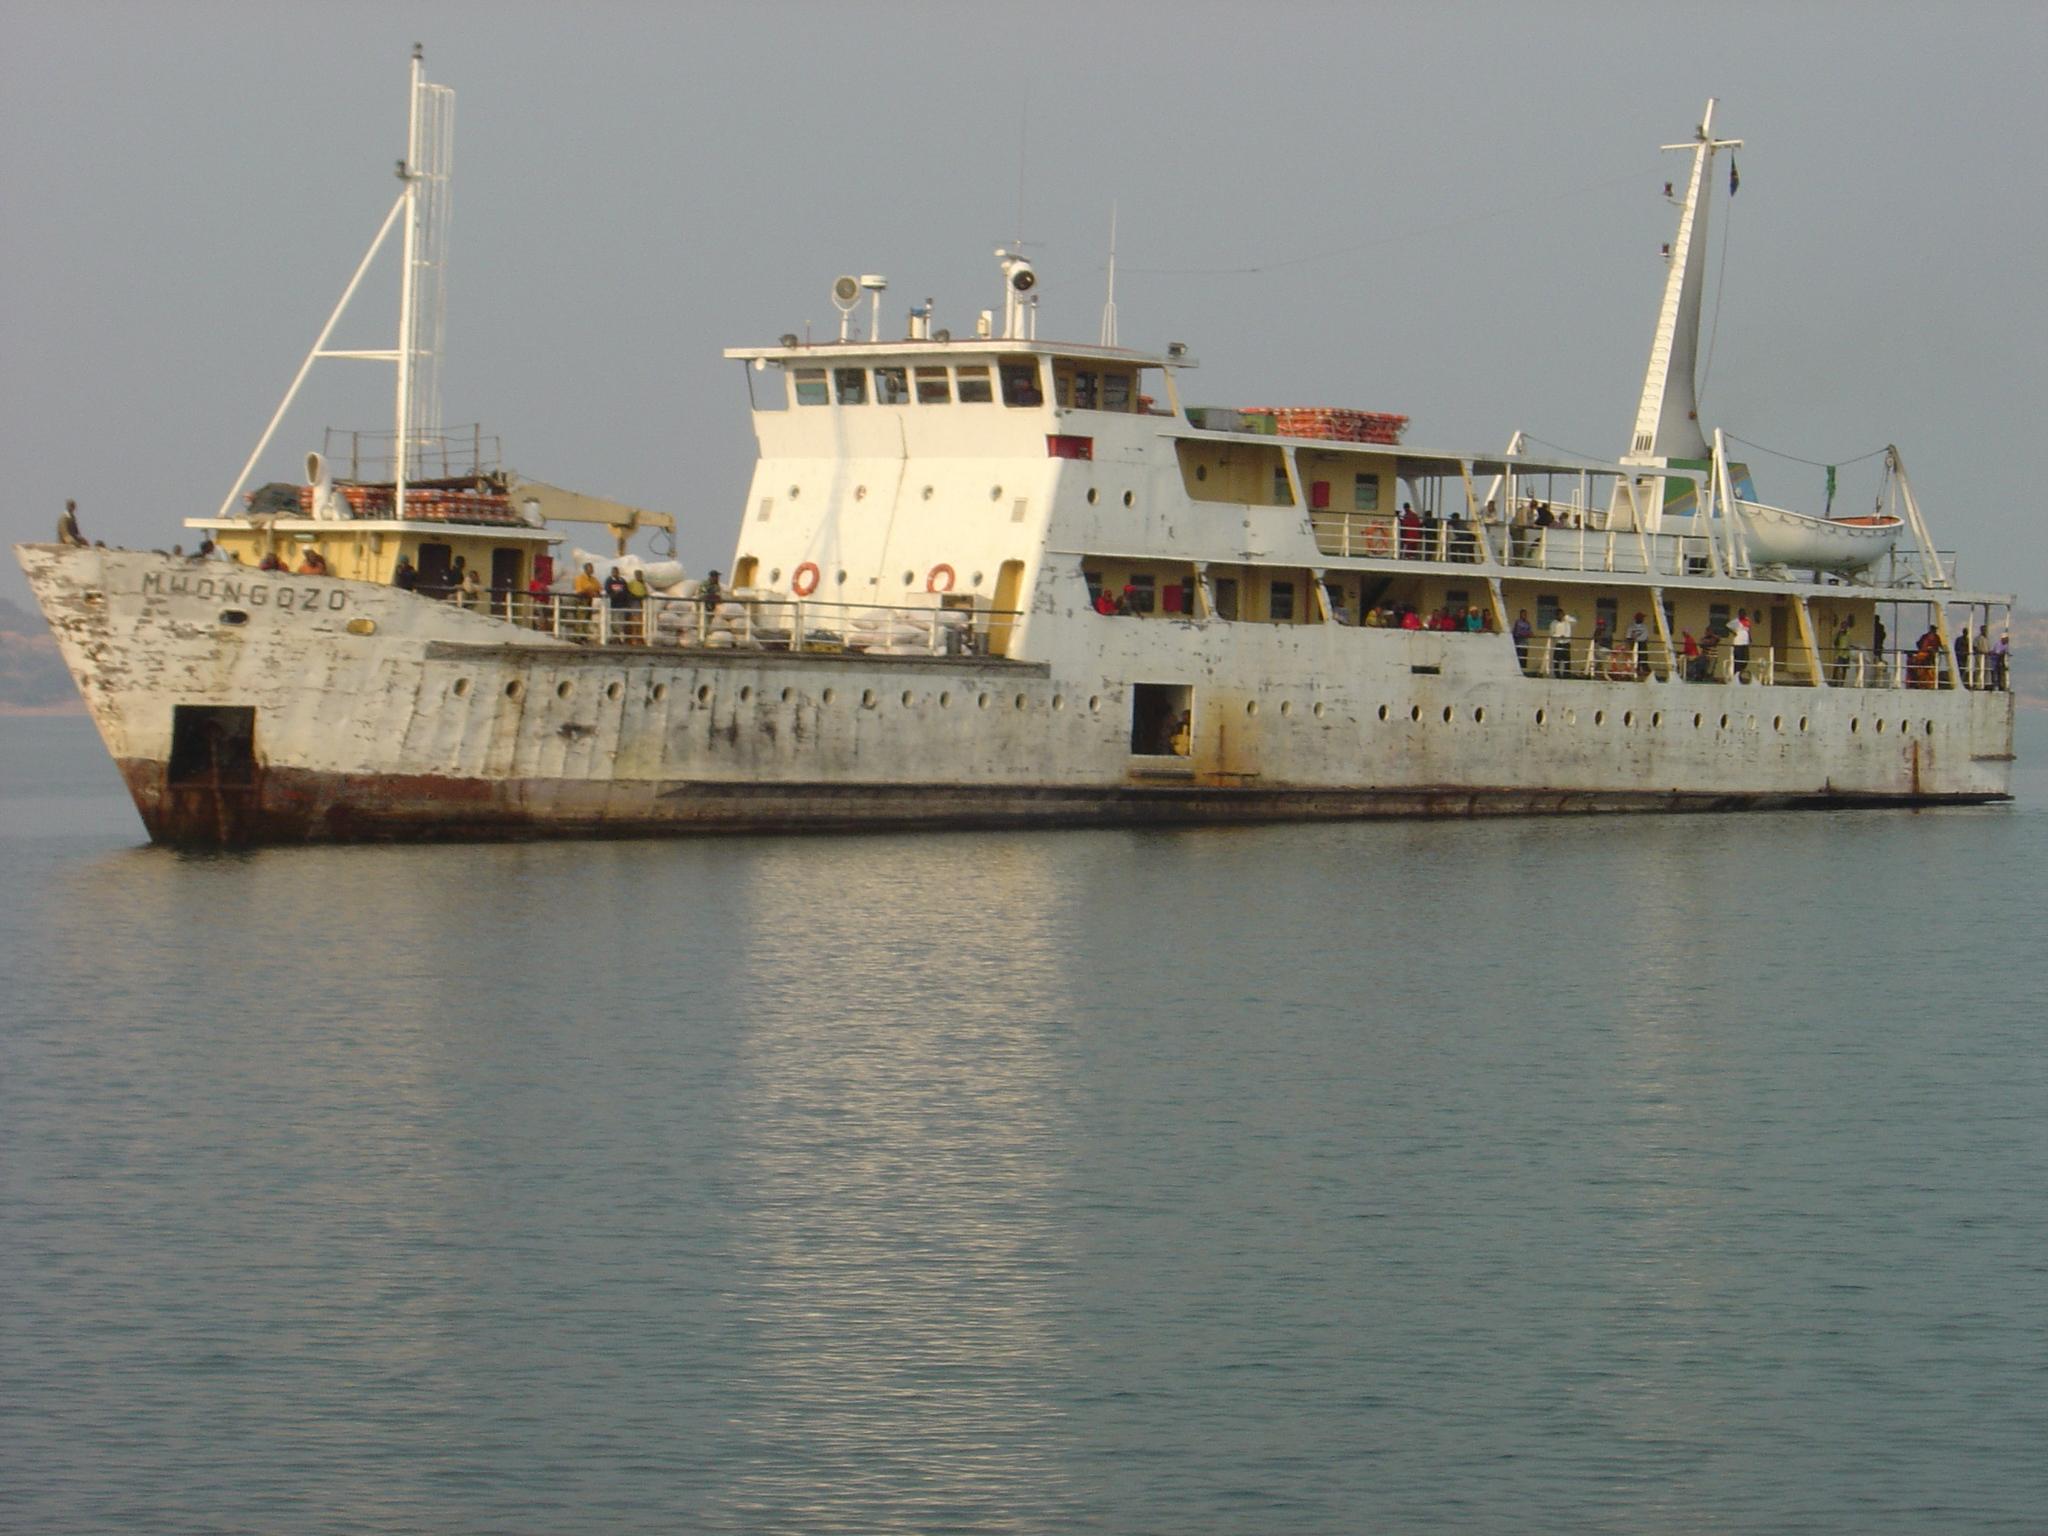 Passagier und Frachtschiff Mwongozo